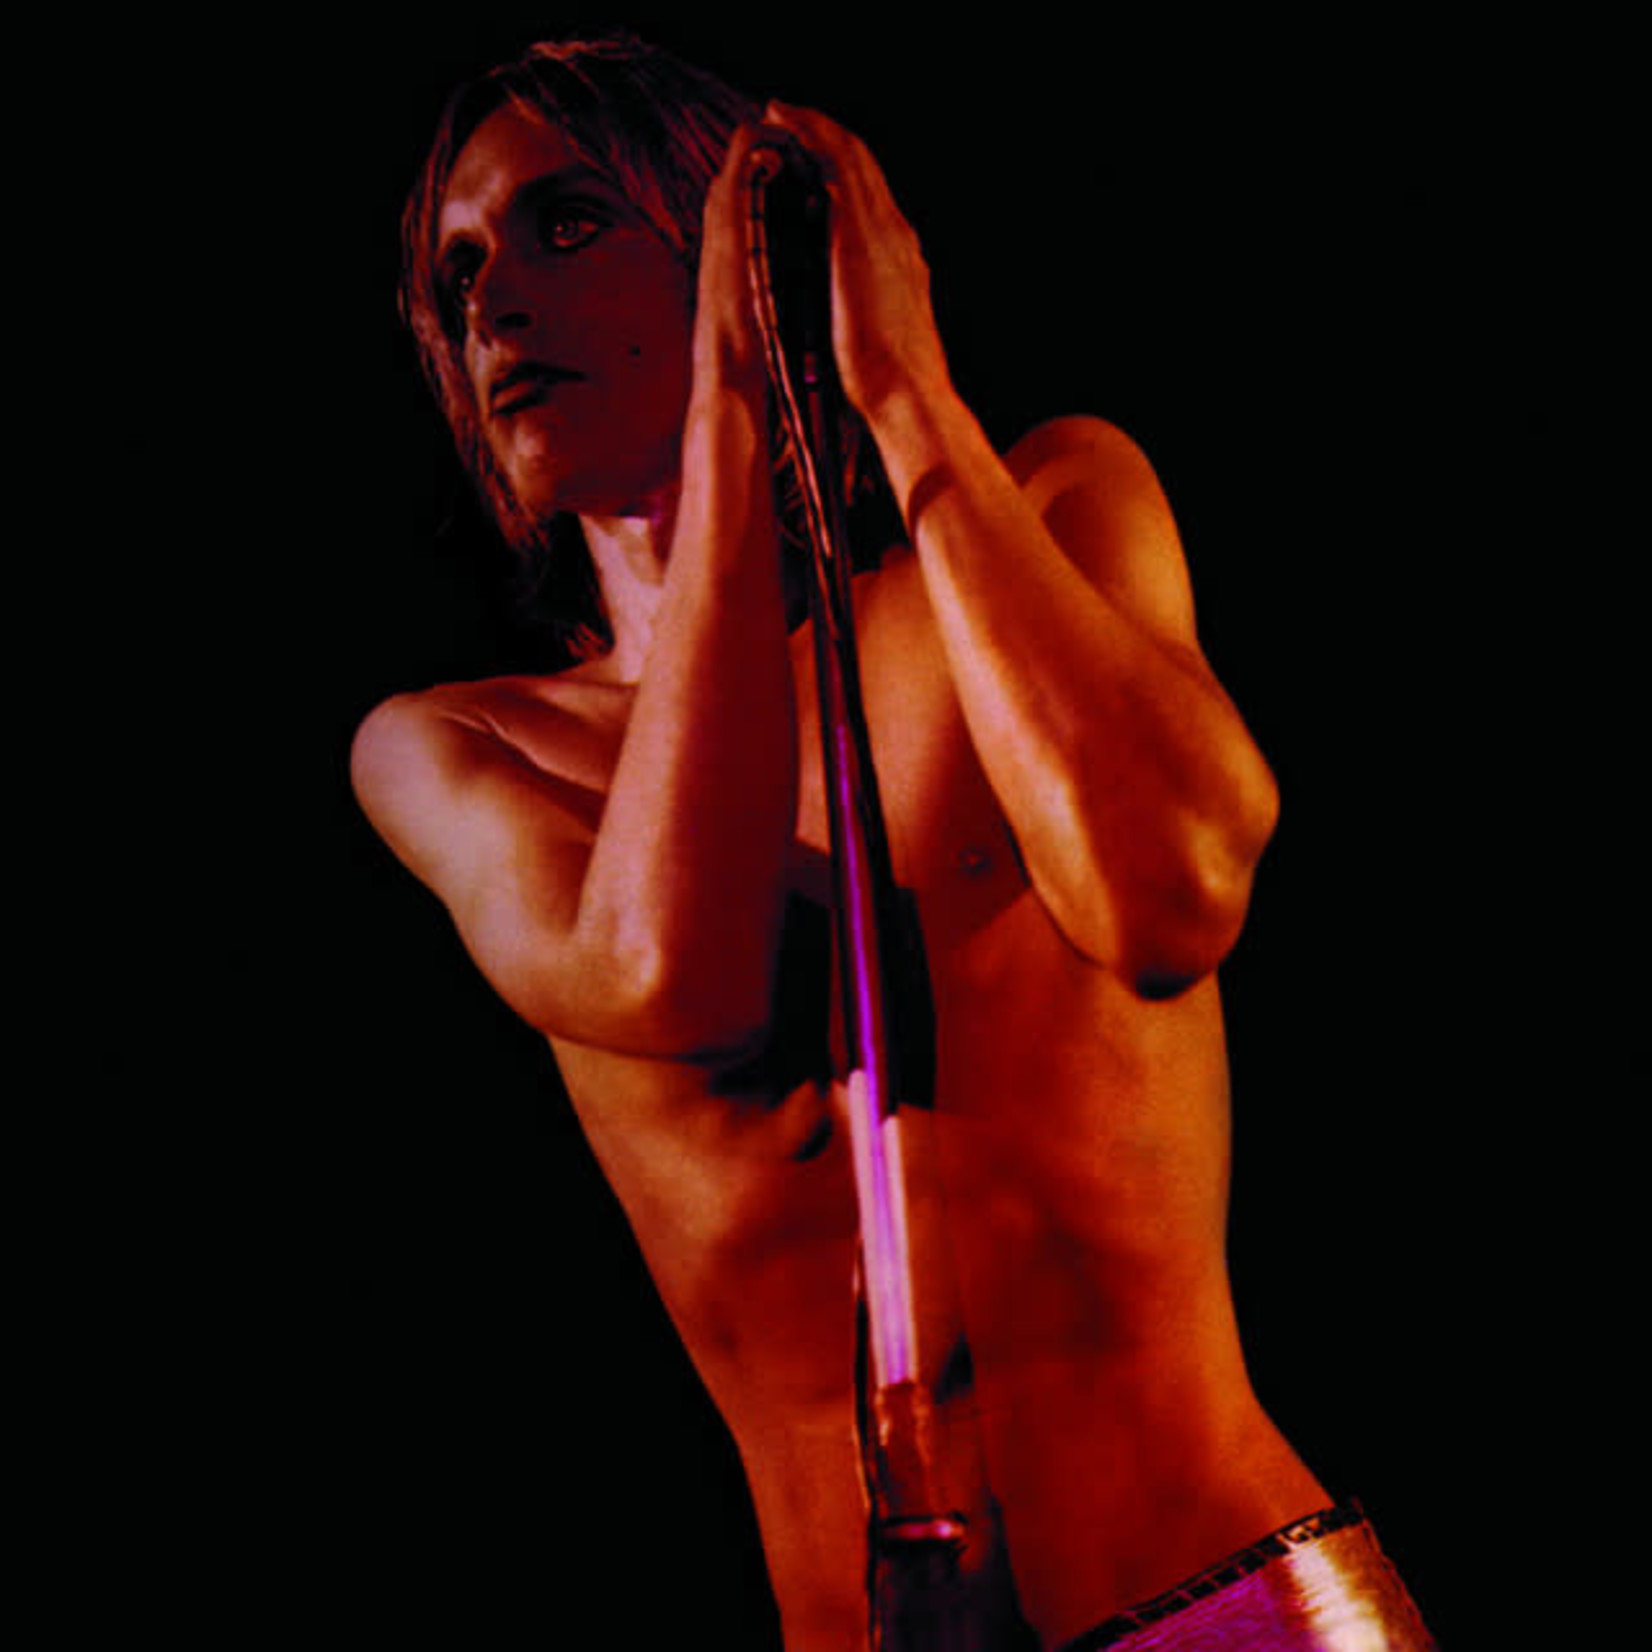 Vinyl Iggy & The Stooges - Raw Power